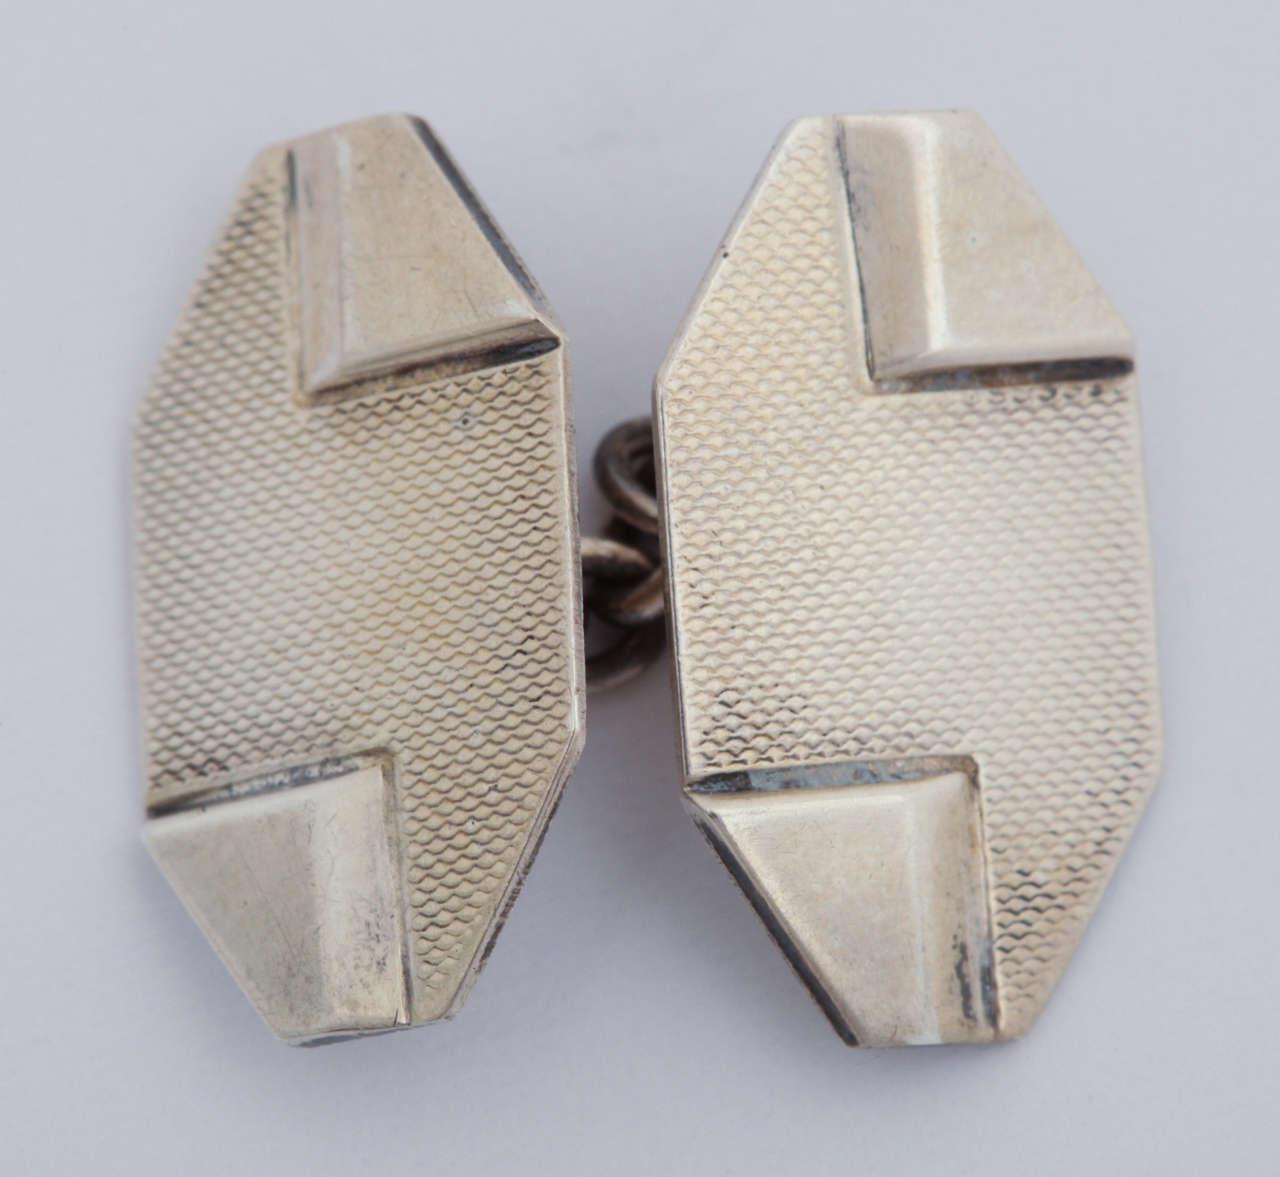 1920s-1930s Art Deco Silver Cufflinks For Sale 2